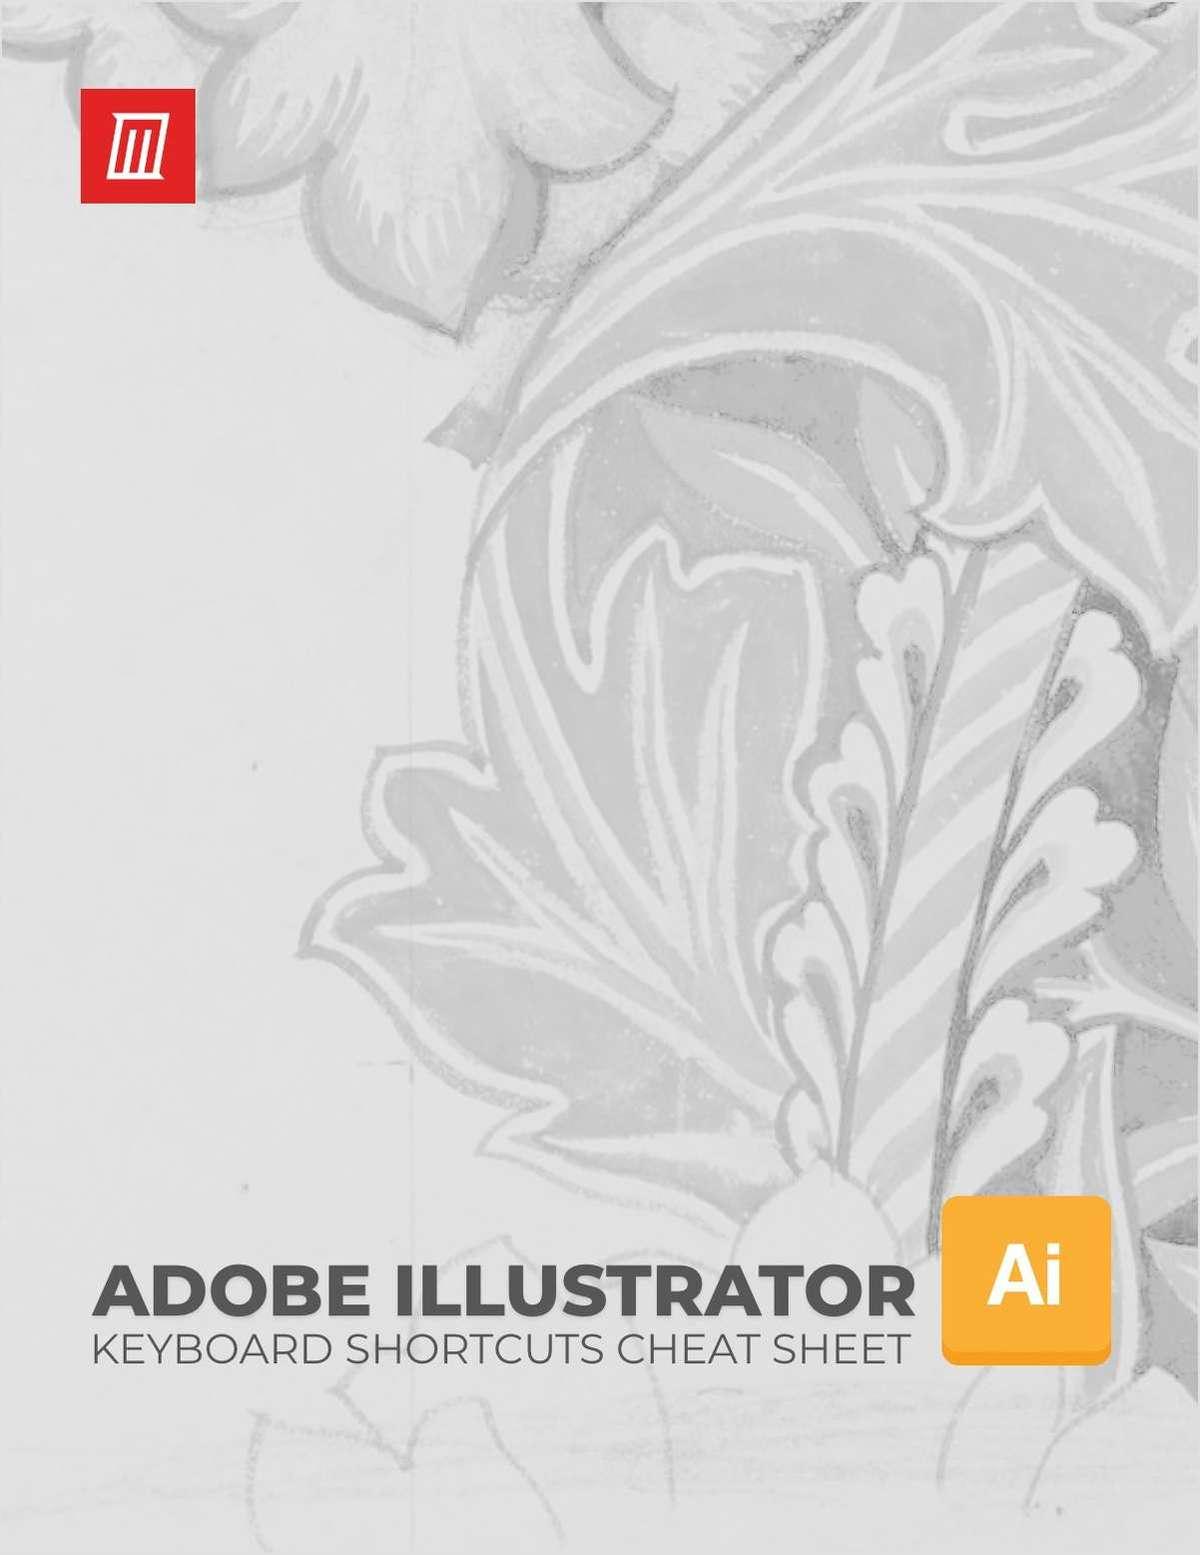 Adobe Illustrator Keyboard Shortcuts Cheat Sheet